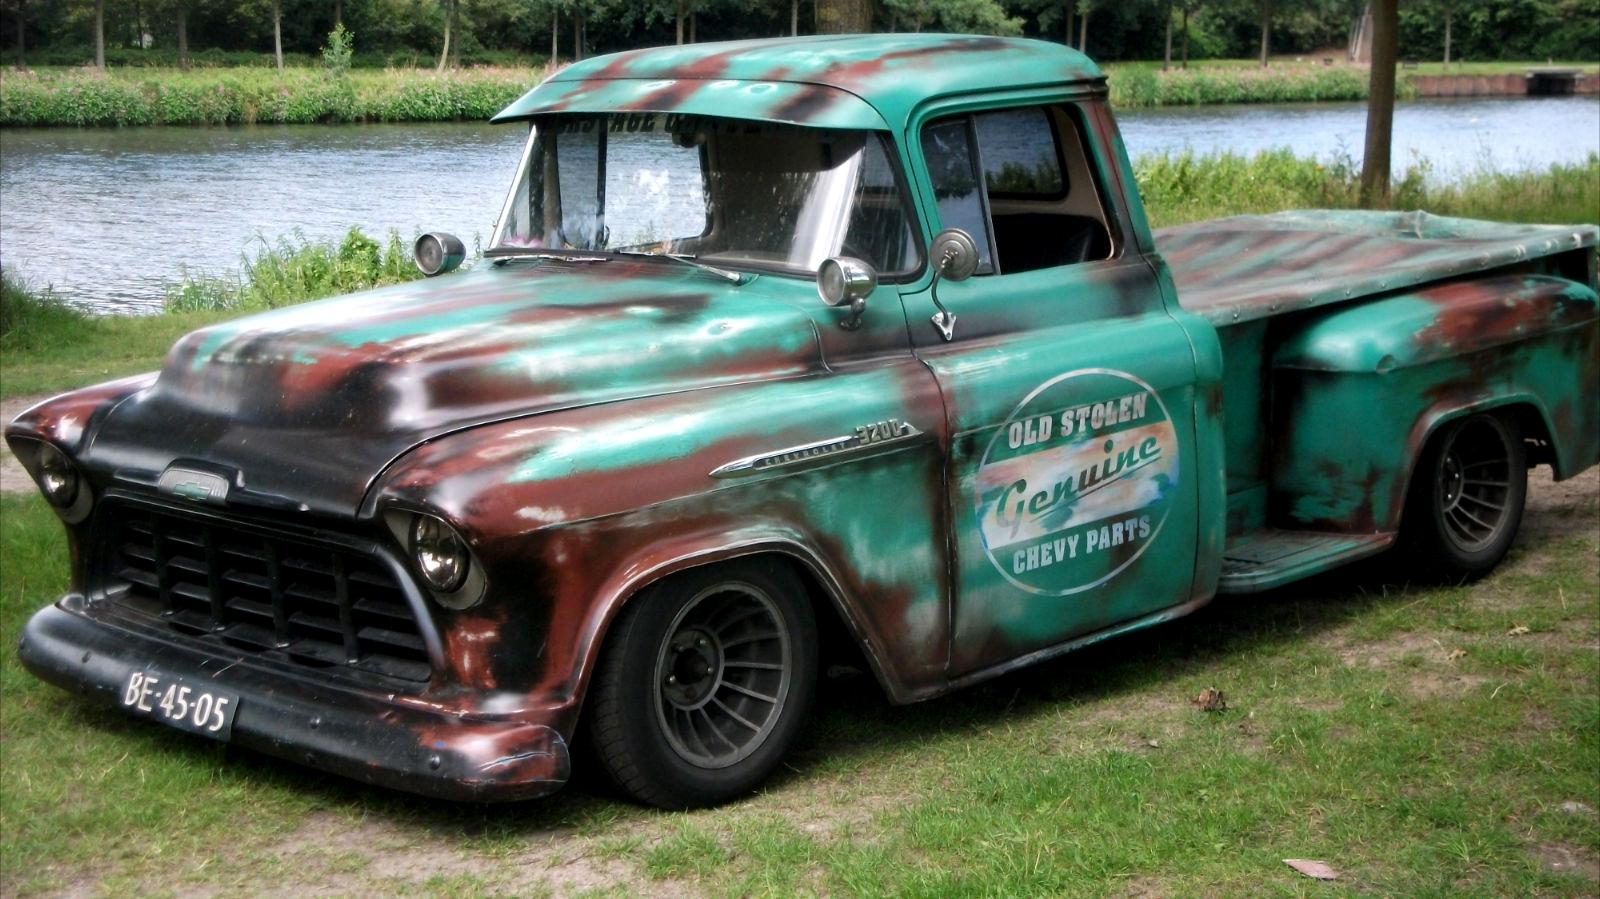 Chevy_Apache_stepside_pickup_for_sale_247Autoholic%20blog%20(3).JPG